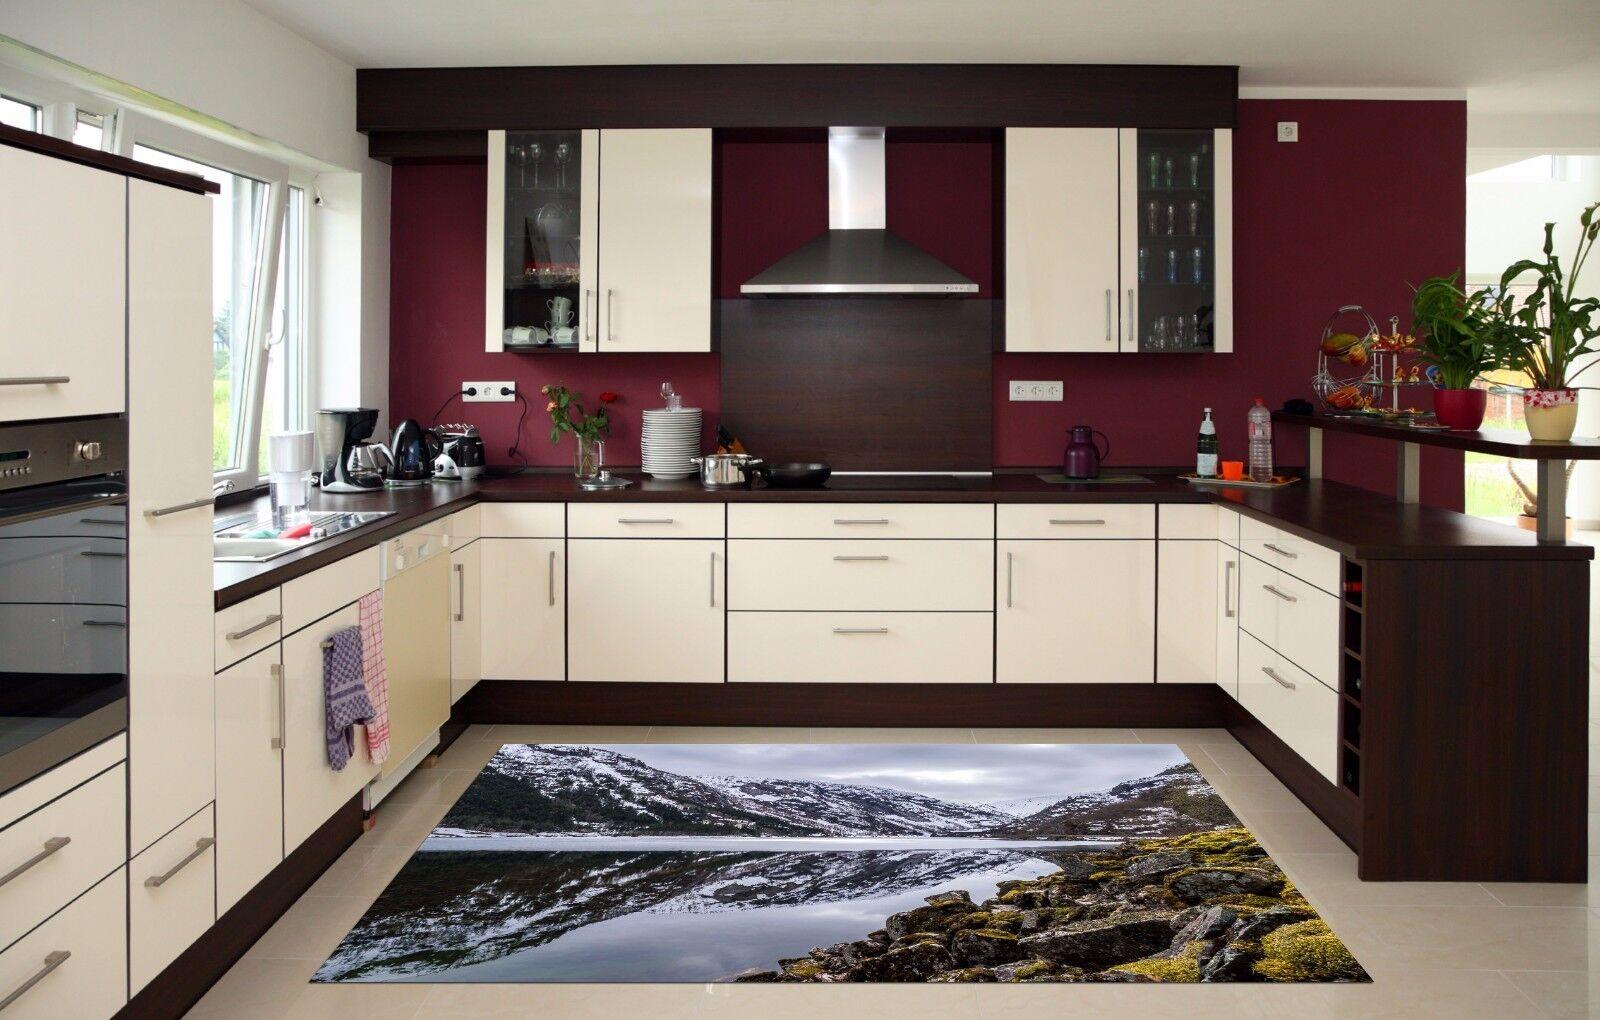 3D Hillside Sea 8 Kitchen Mat Floor Murals Wall Print Wall AJ WALLPAPER AU Carly